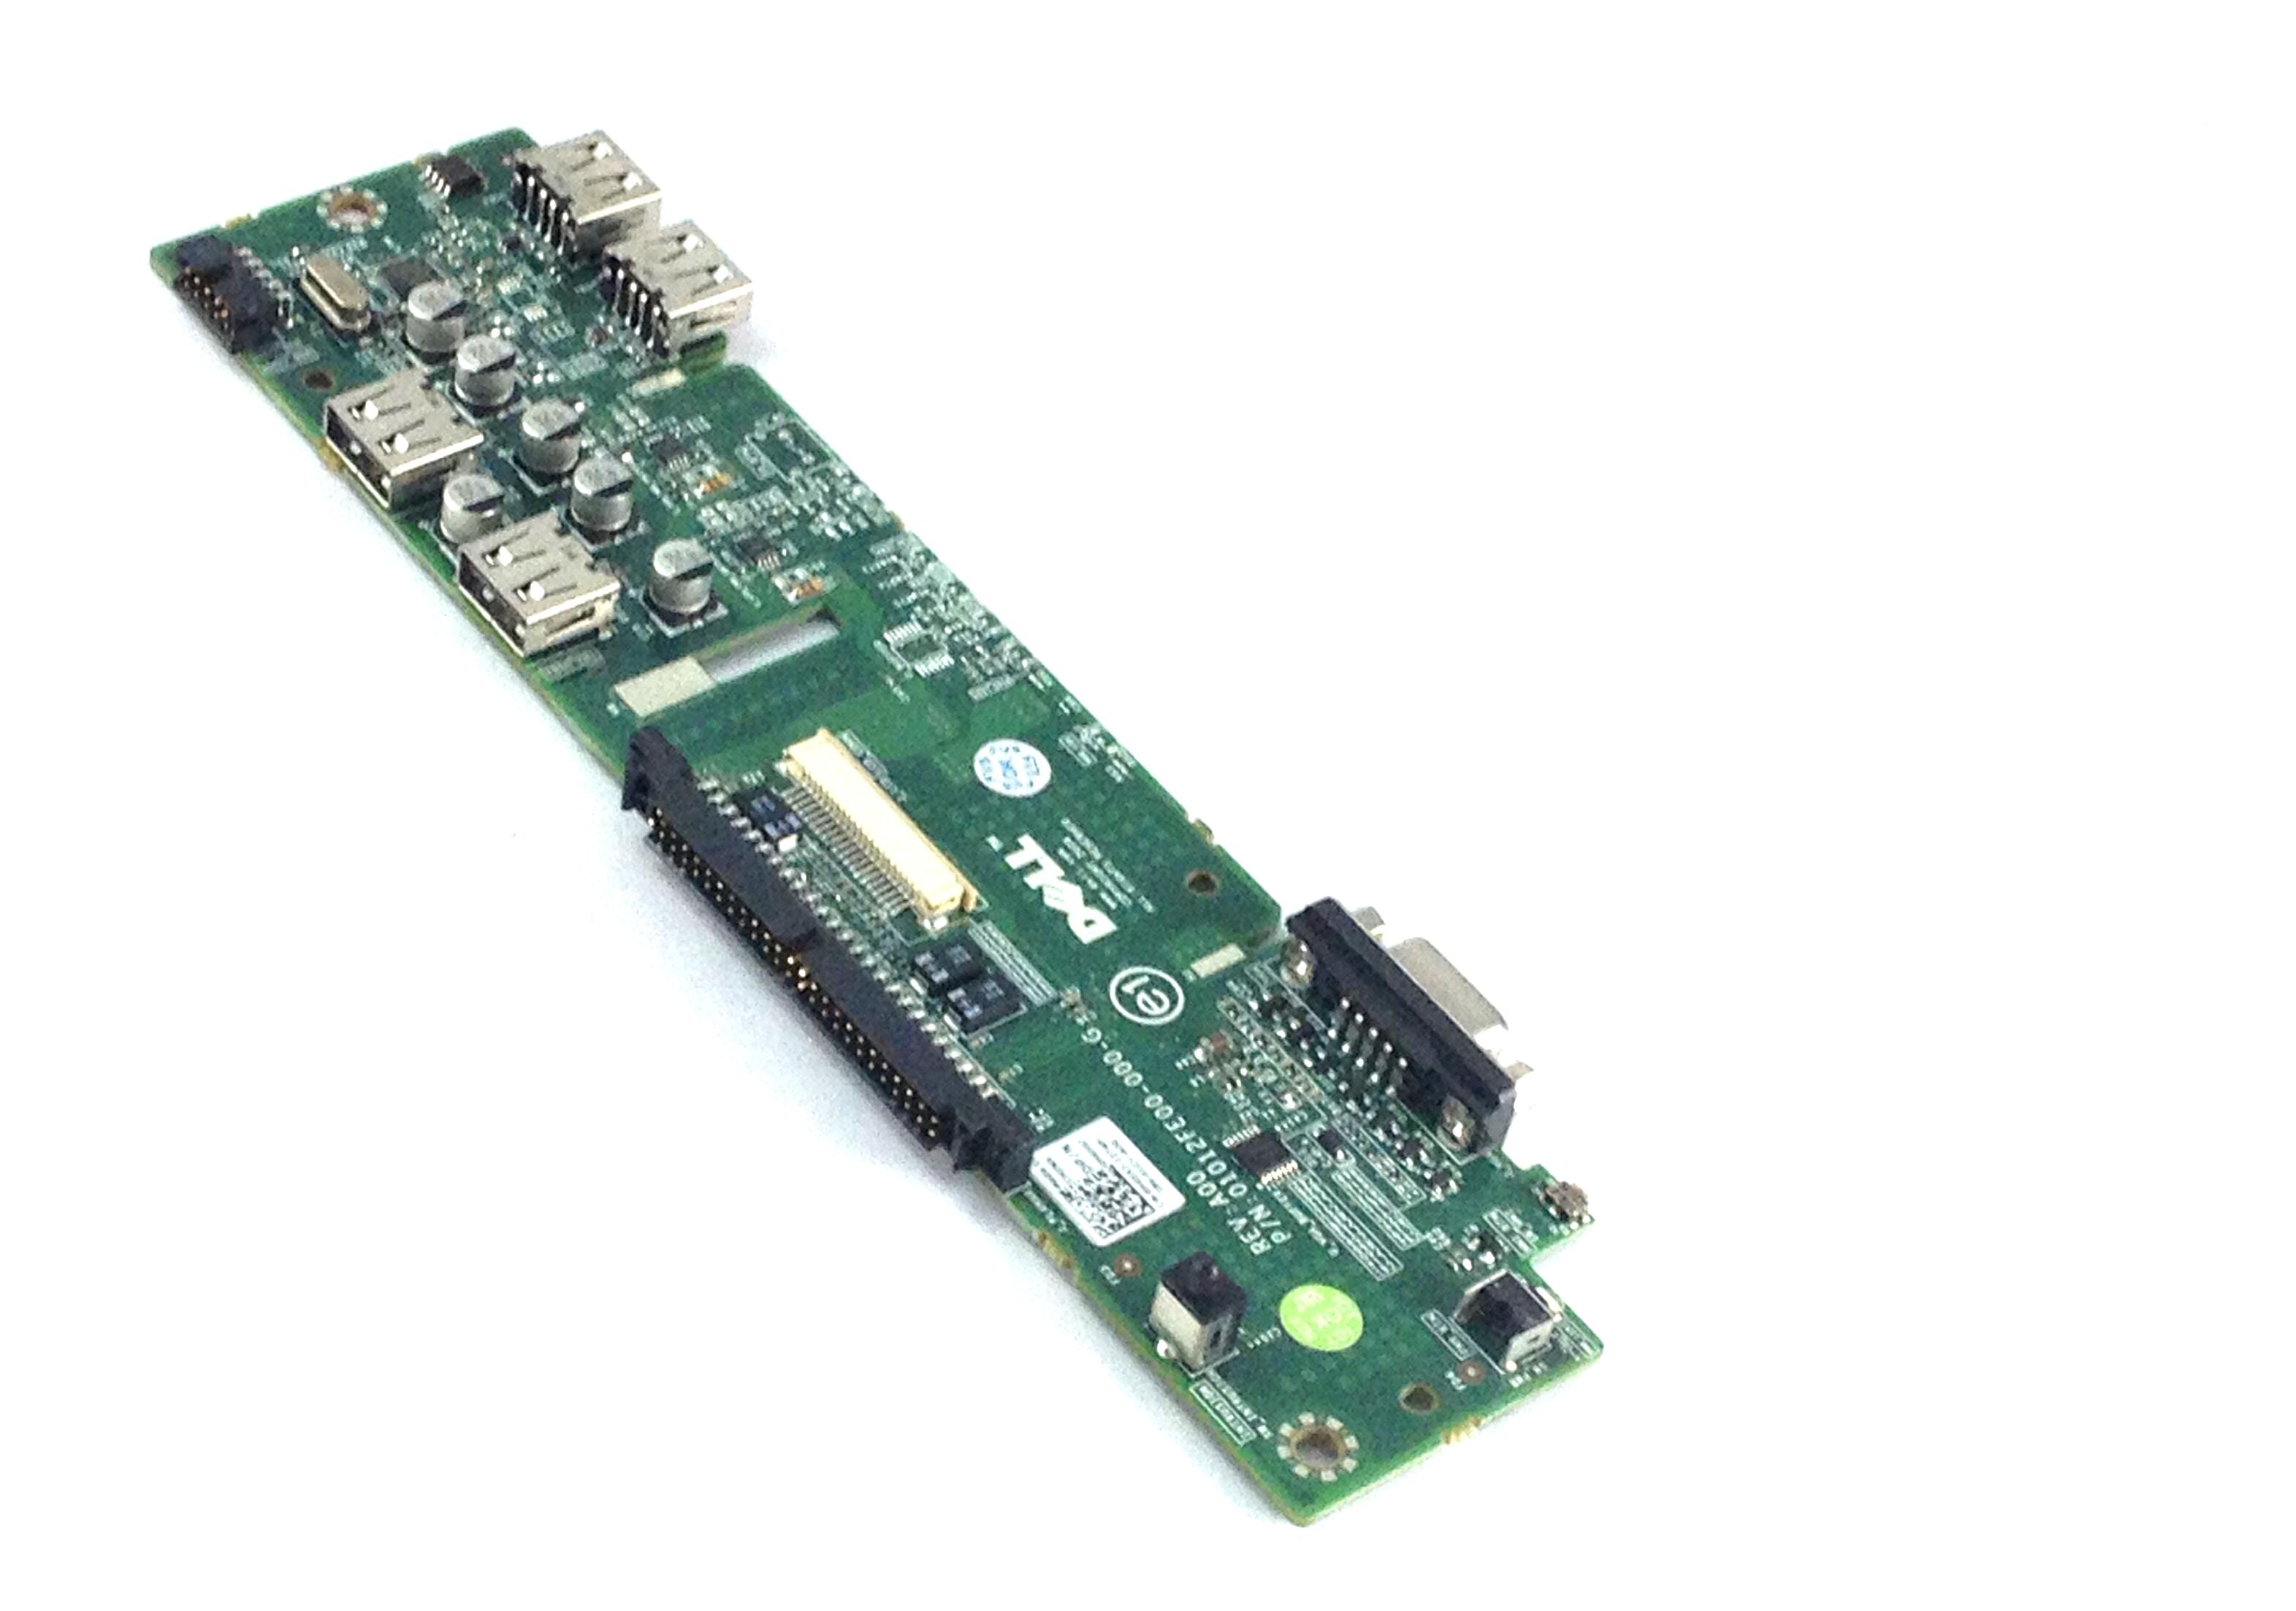 DELL POWEREDGE R510 R515 SERVER USB//VGA CONTROL PANEL BOARD H655J